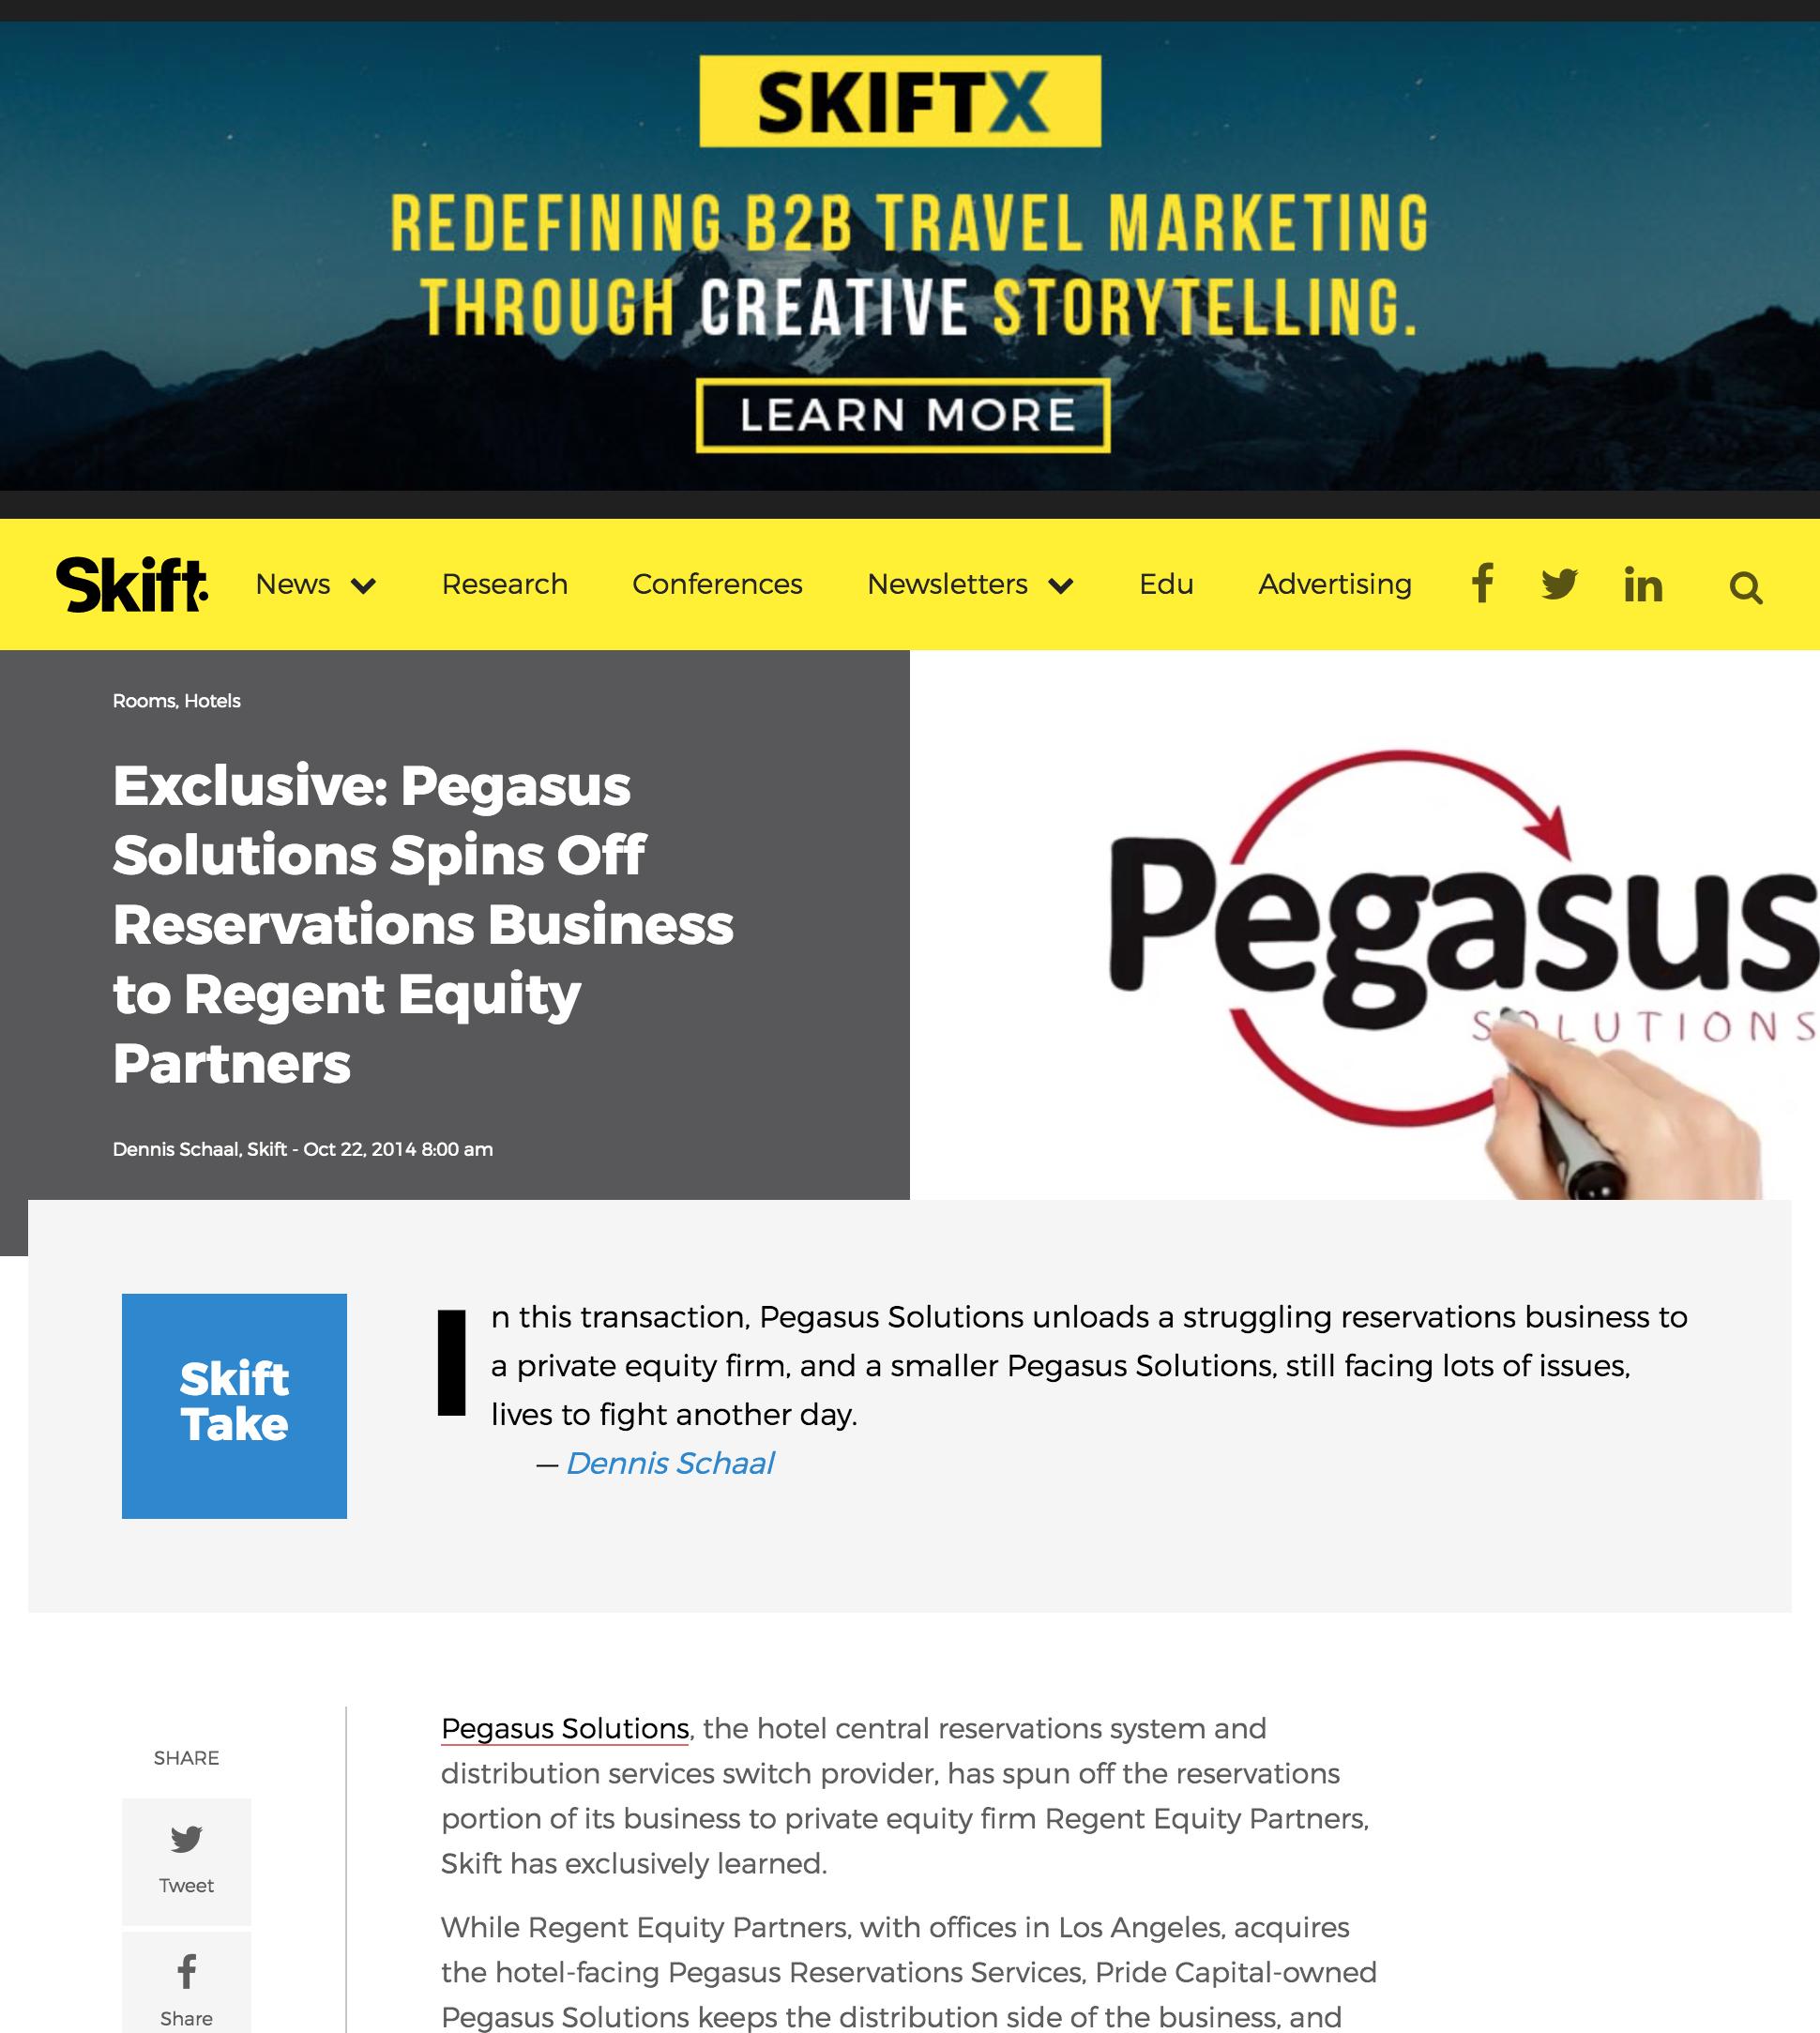 Pegasus Solutions Spins Off Reservations Business to Regent - Skift, October 22, 2014